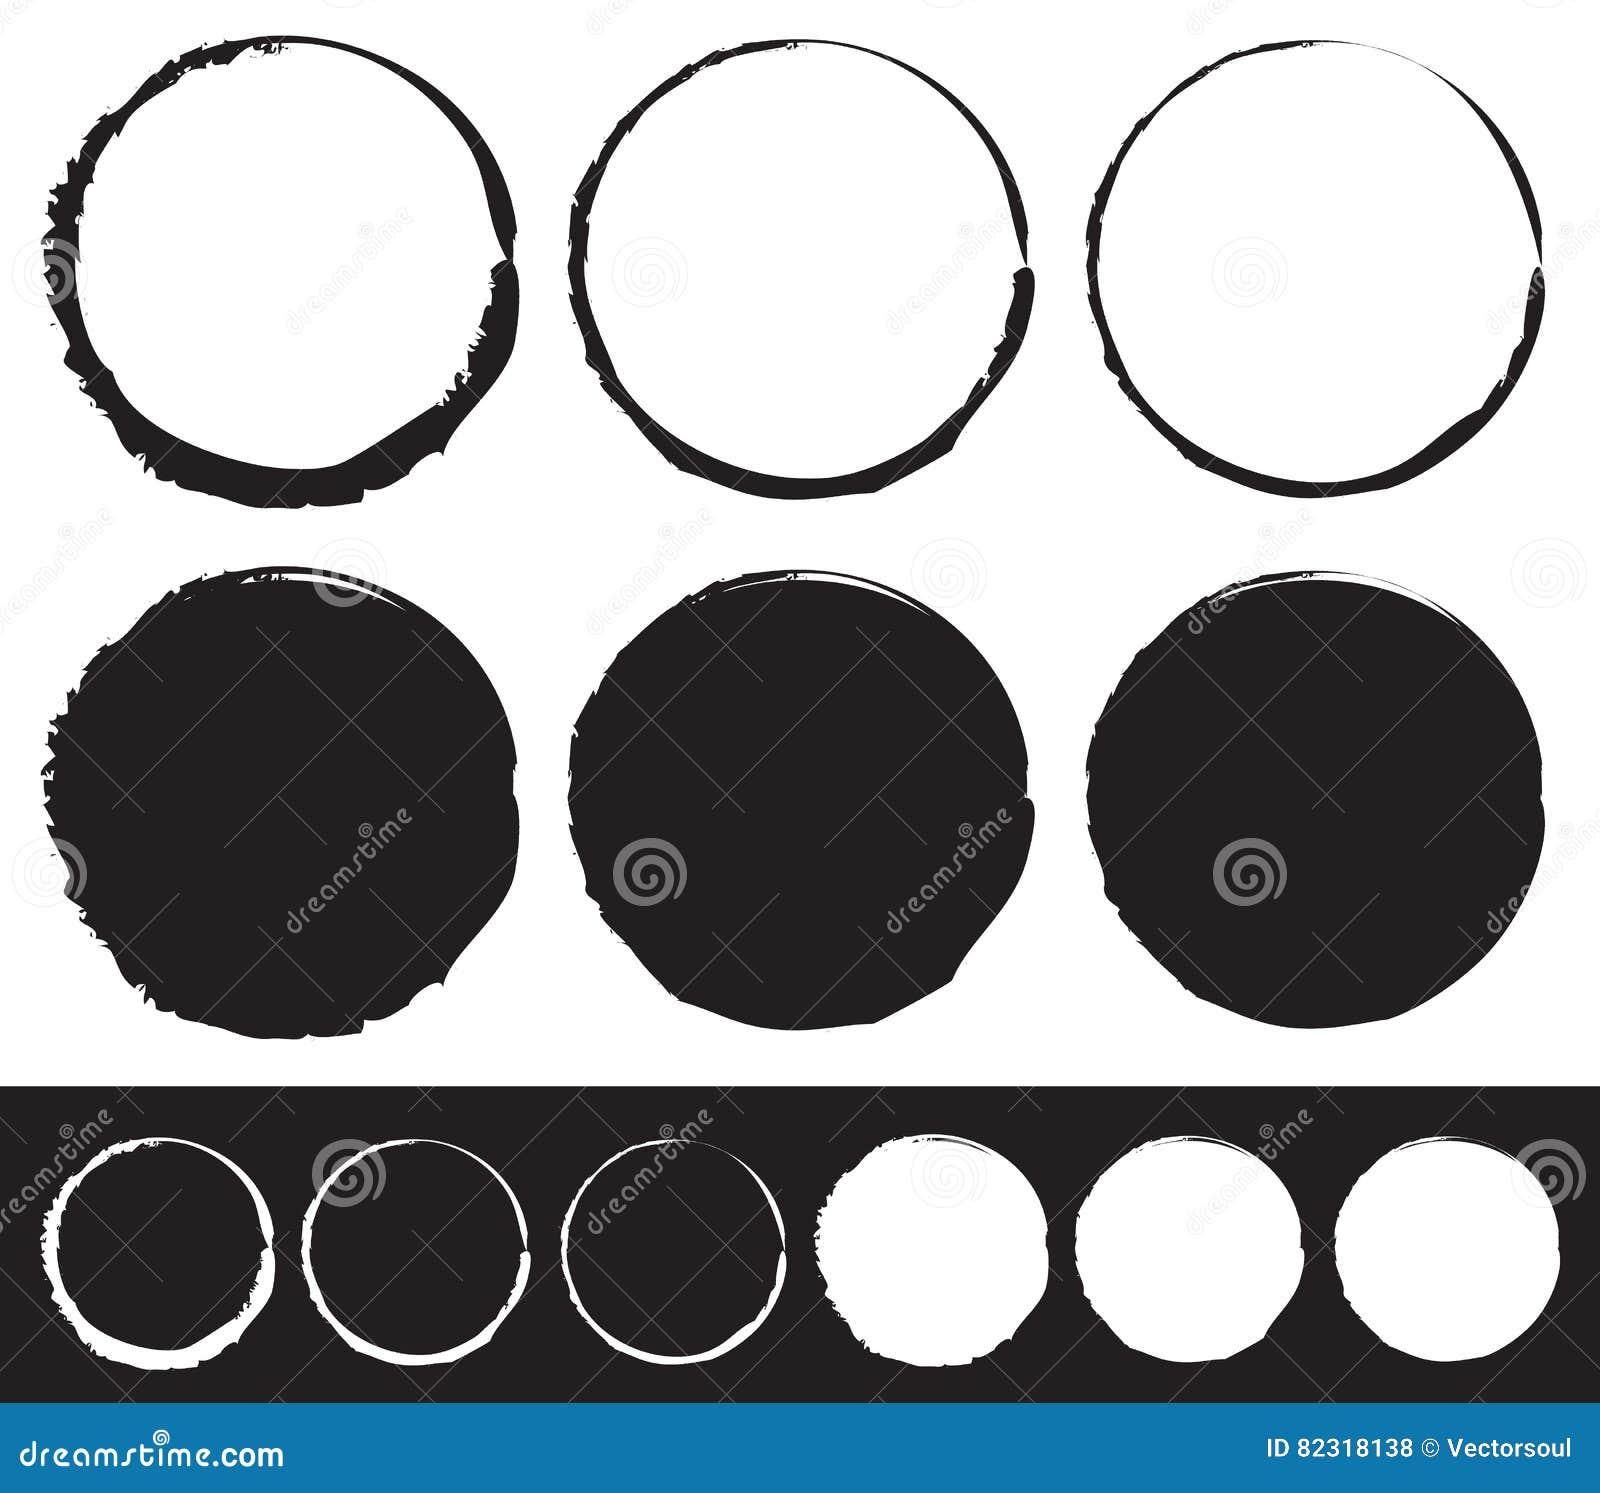 Grungy geplaatst cirkelelement - Cirkels met bevlekte, gesmeerde verf